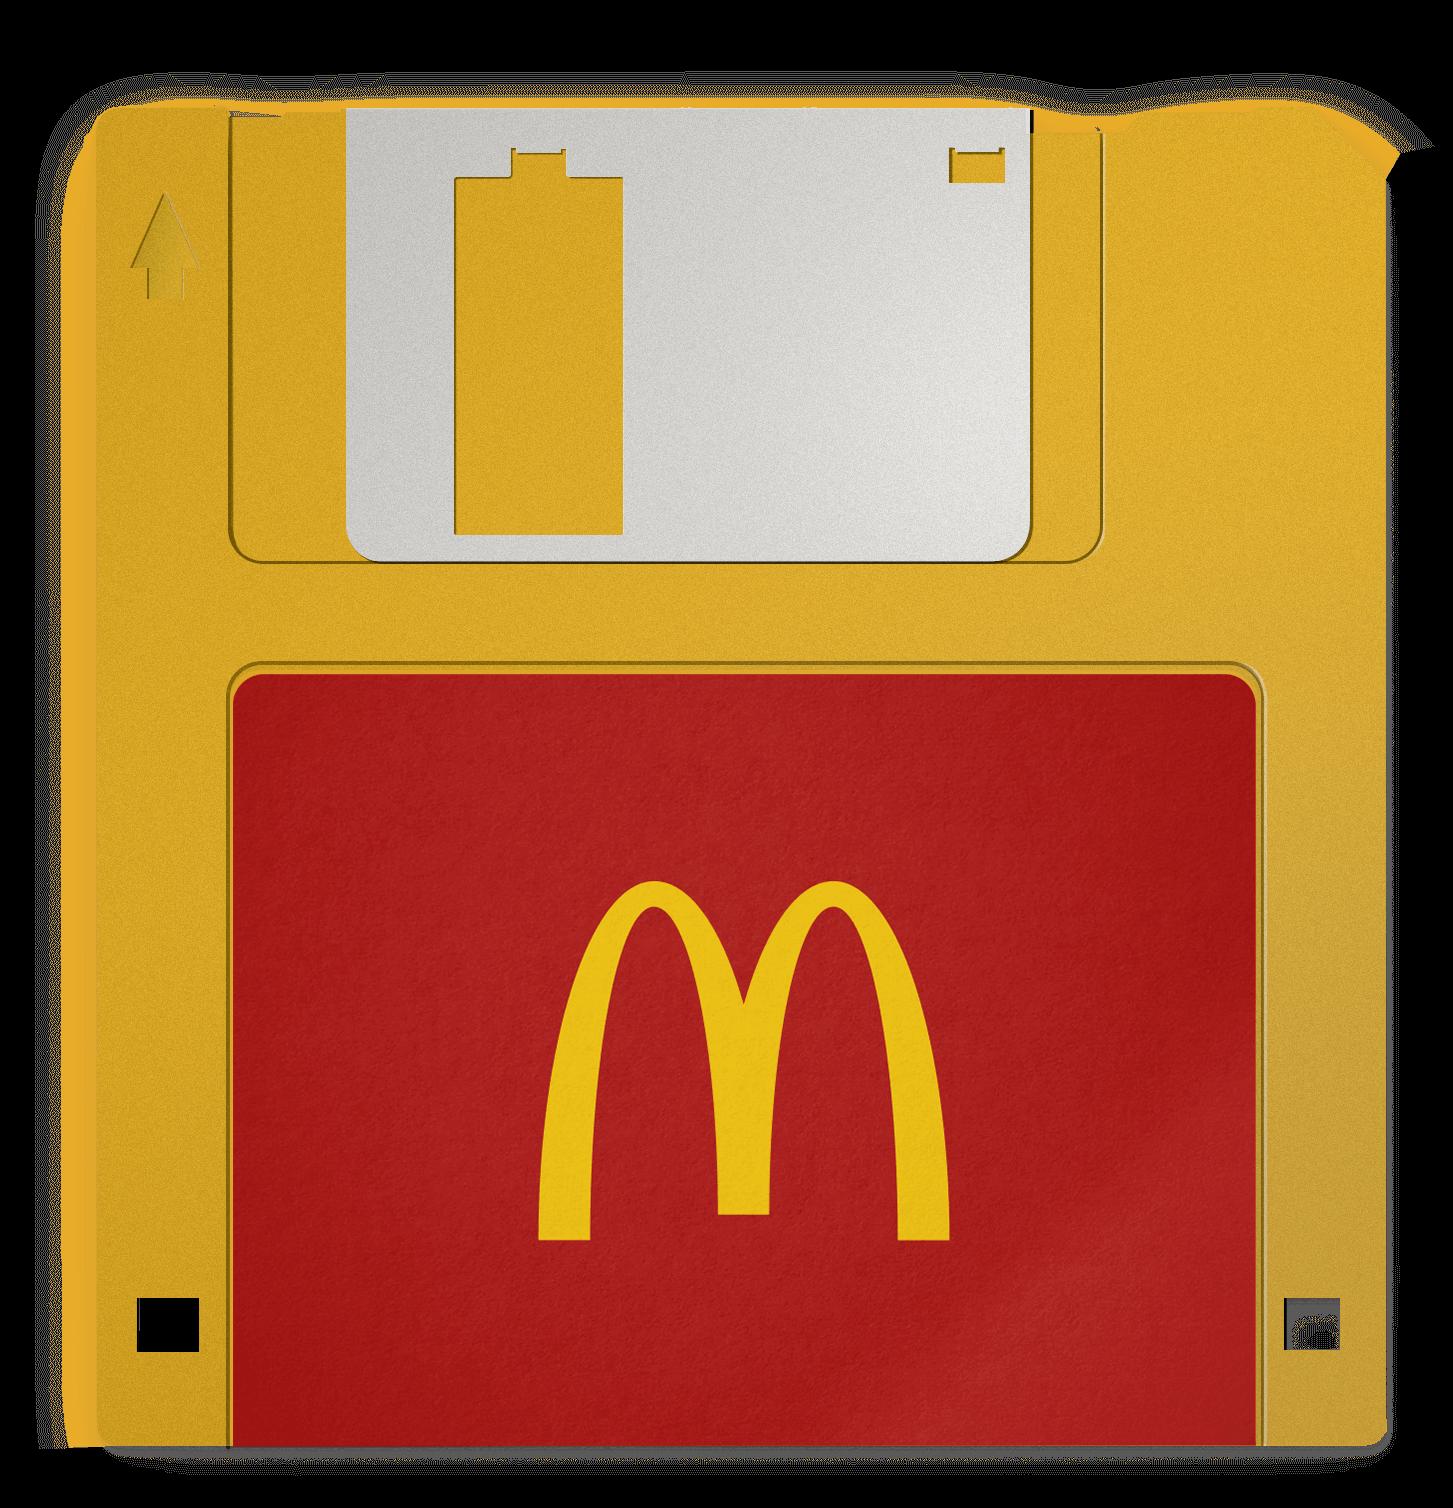 Mixed McDonald's